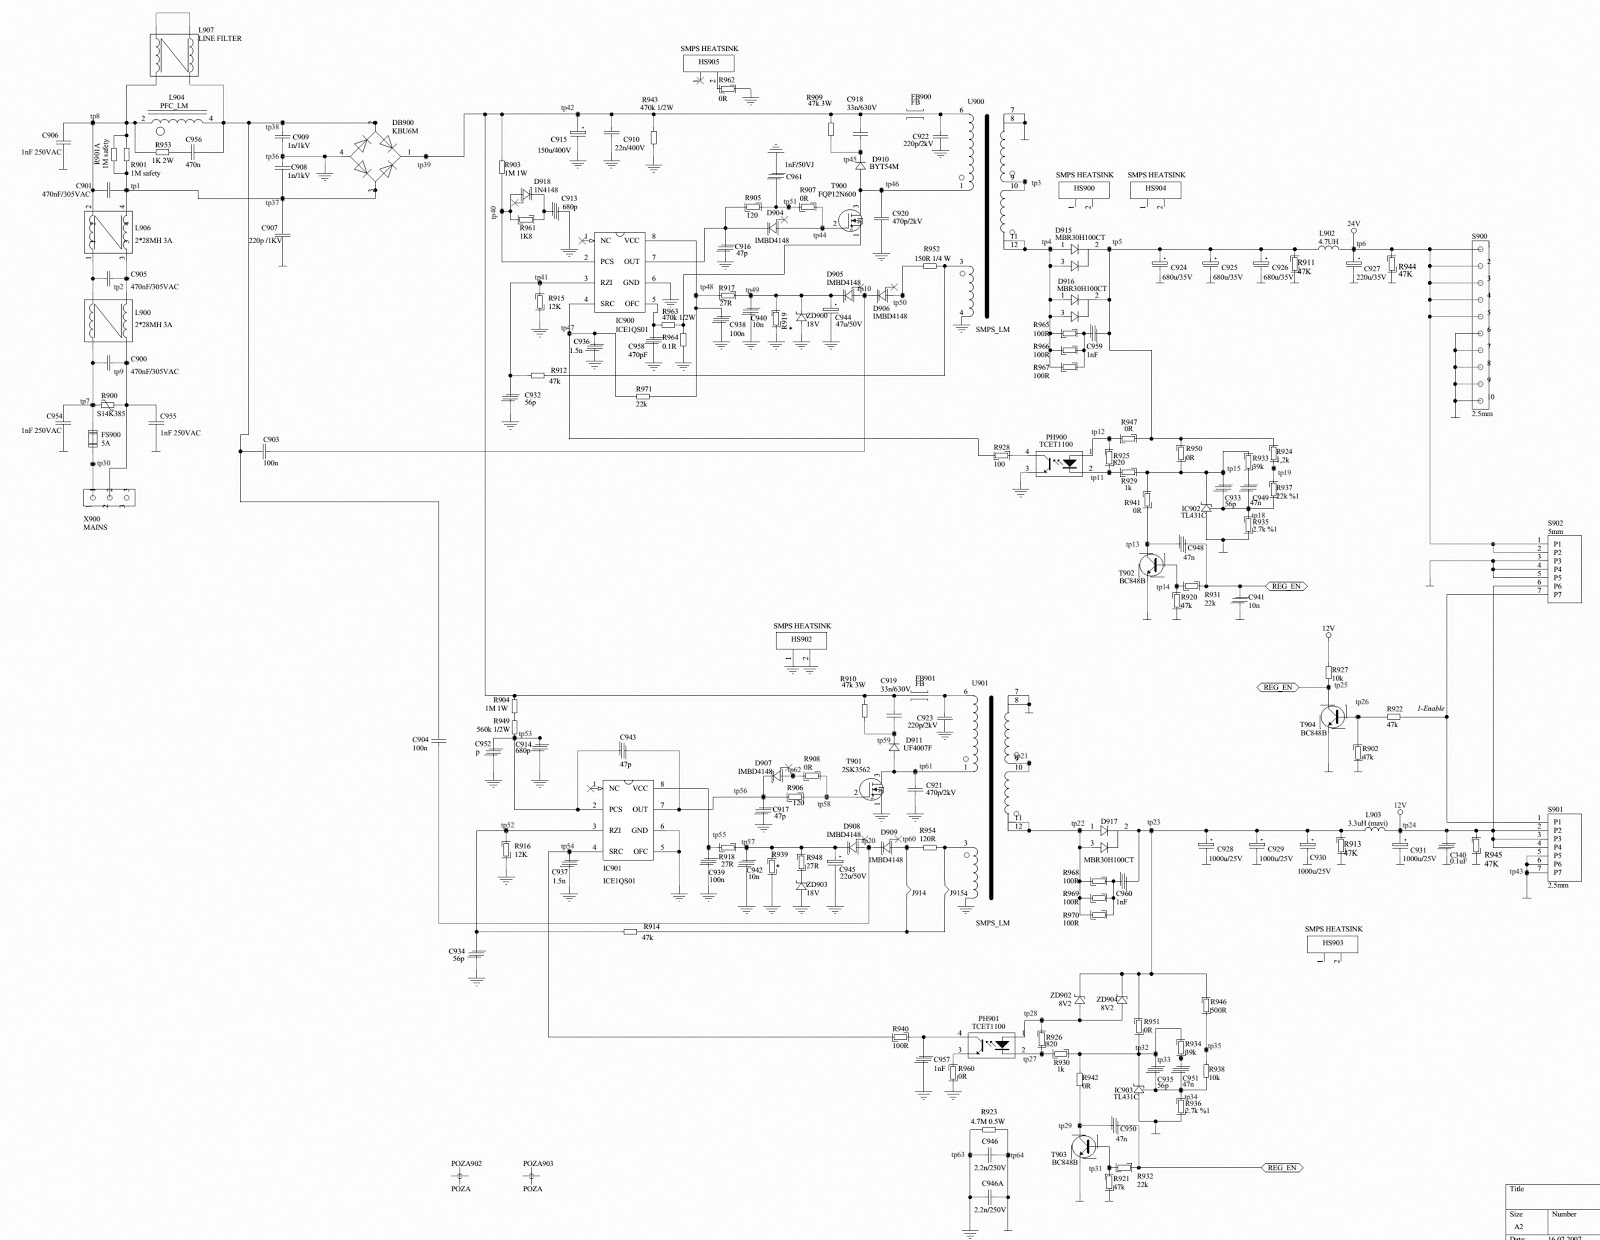 Beko Z1j194 11 And Dynex Lc22hv40 Smps Circuit Diagram